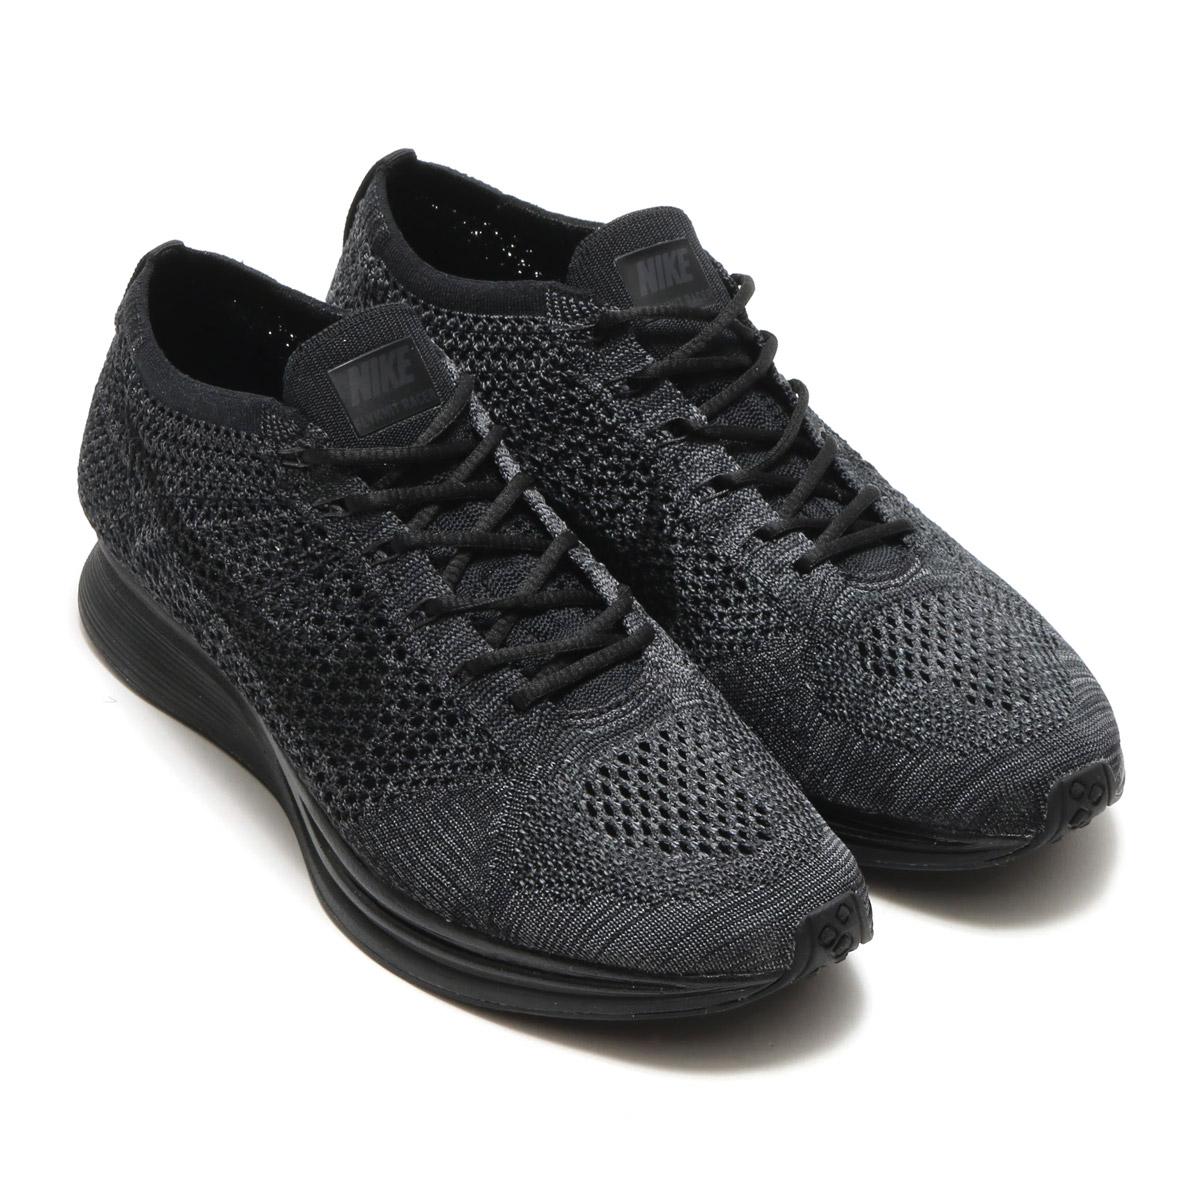 a8ee496f50645 NIKE FLYKNIT RACER (Nike fried food knit racer) (BLACK BLACK-ANTHRACITE)  17FW-I